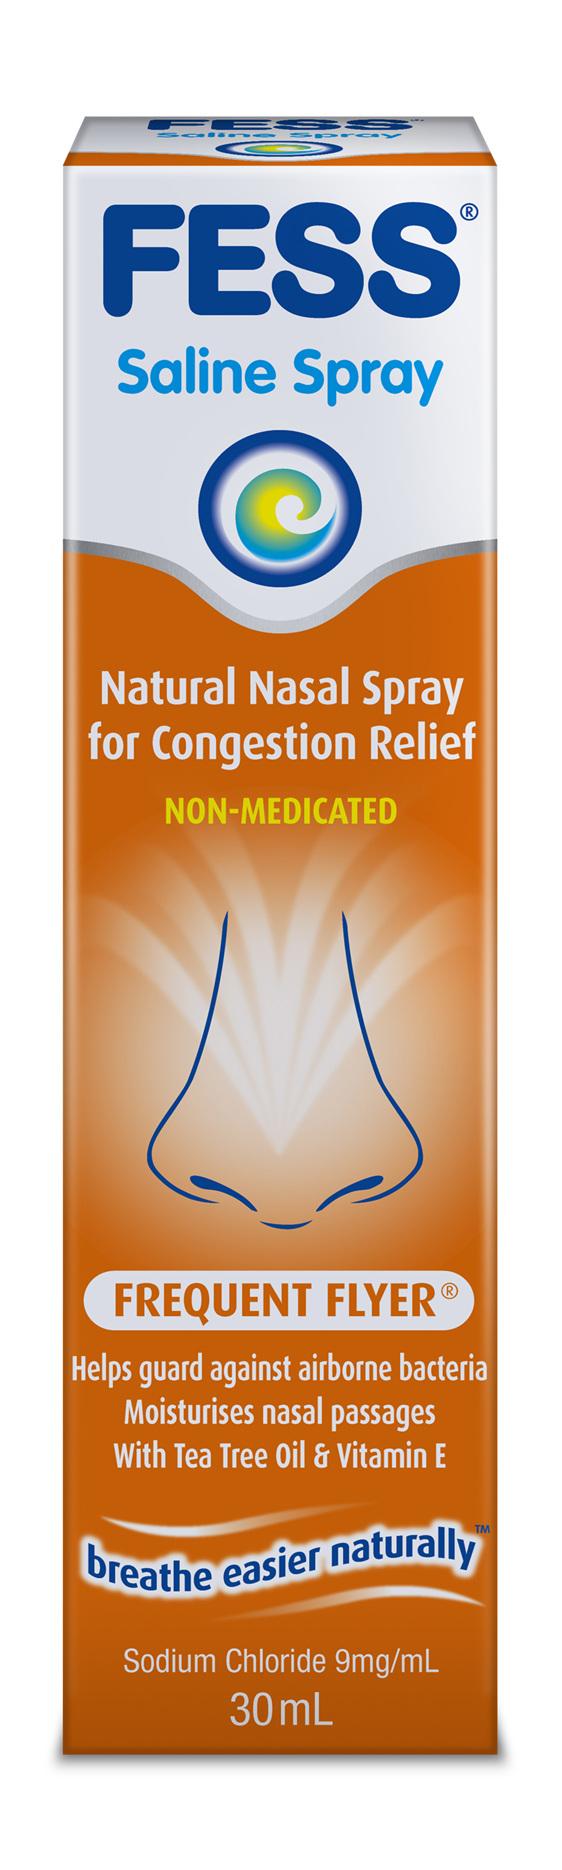 Fess Frequent Flyer Nasal Spray 30 ml